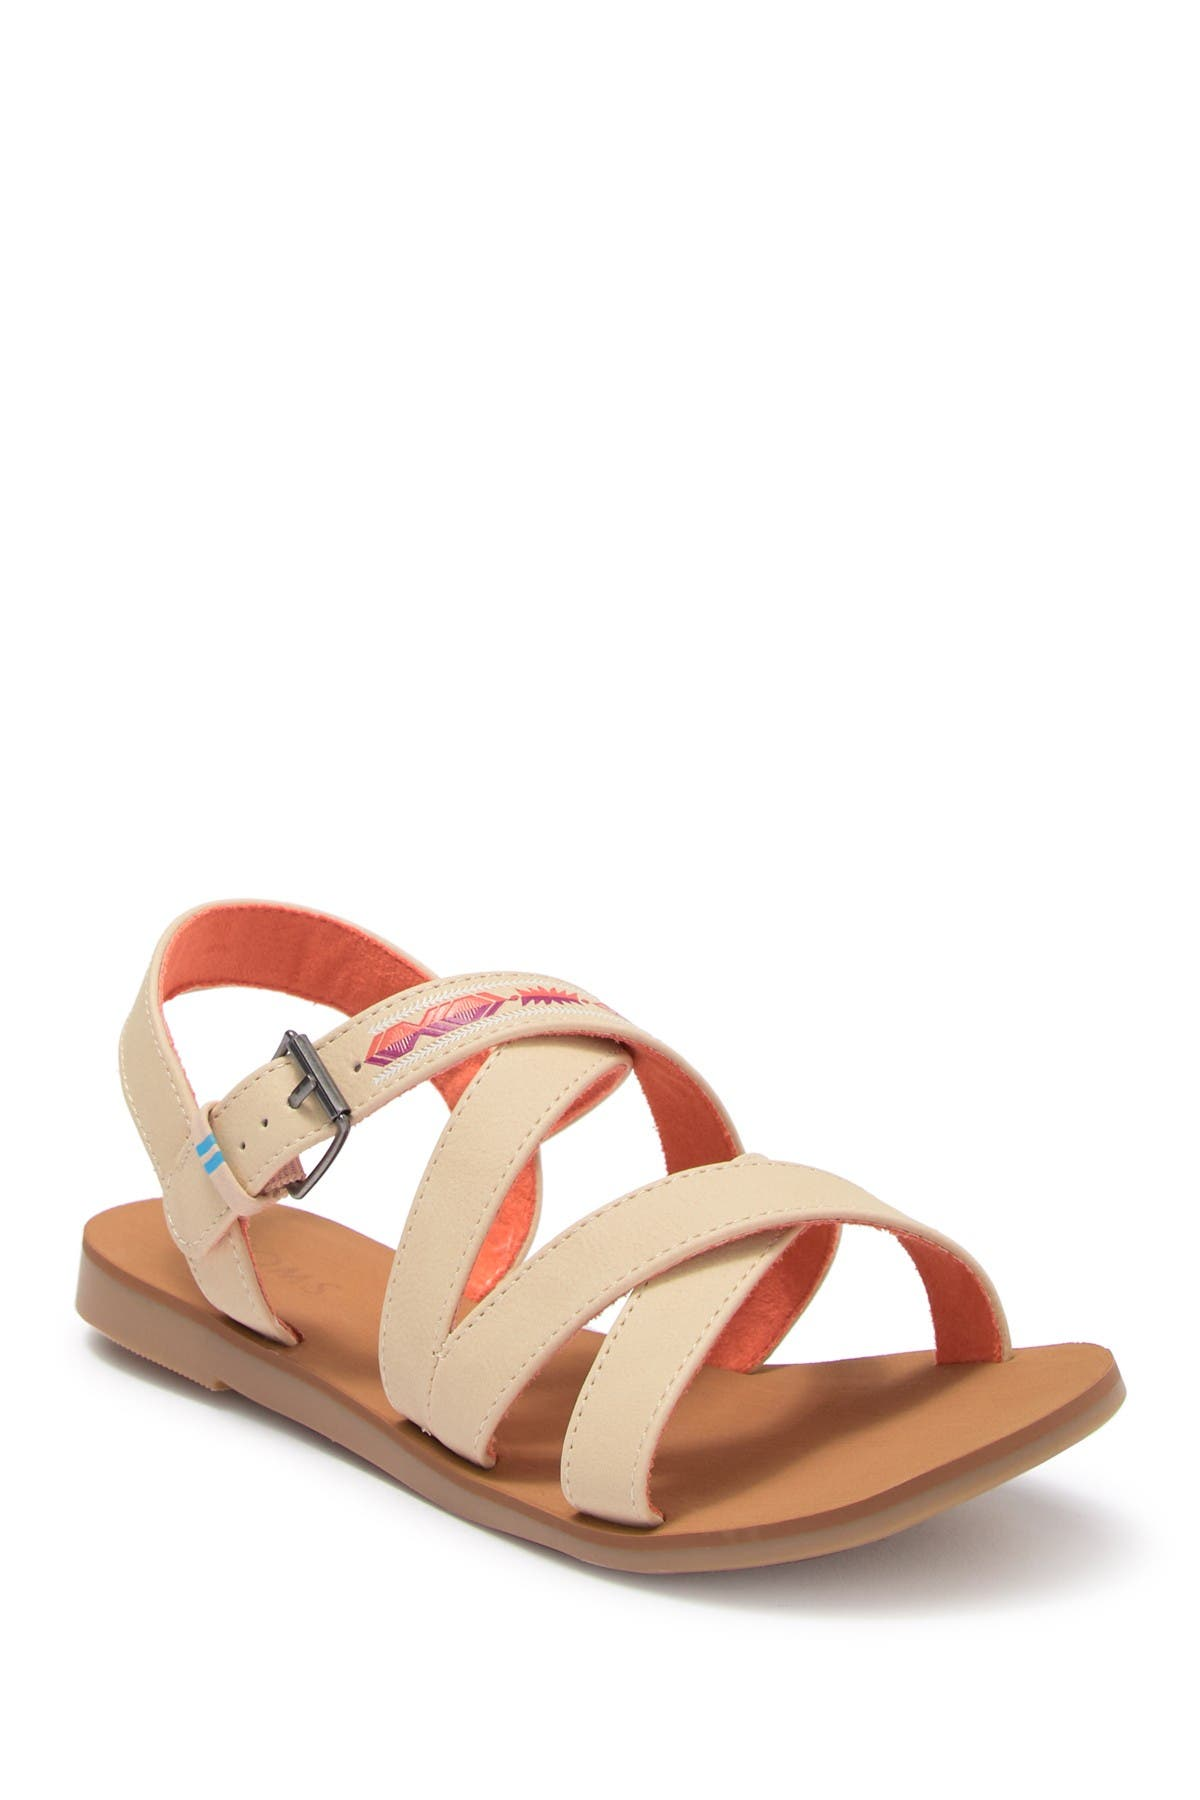 Image of TOMS Sicily Strappy Sandal